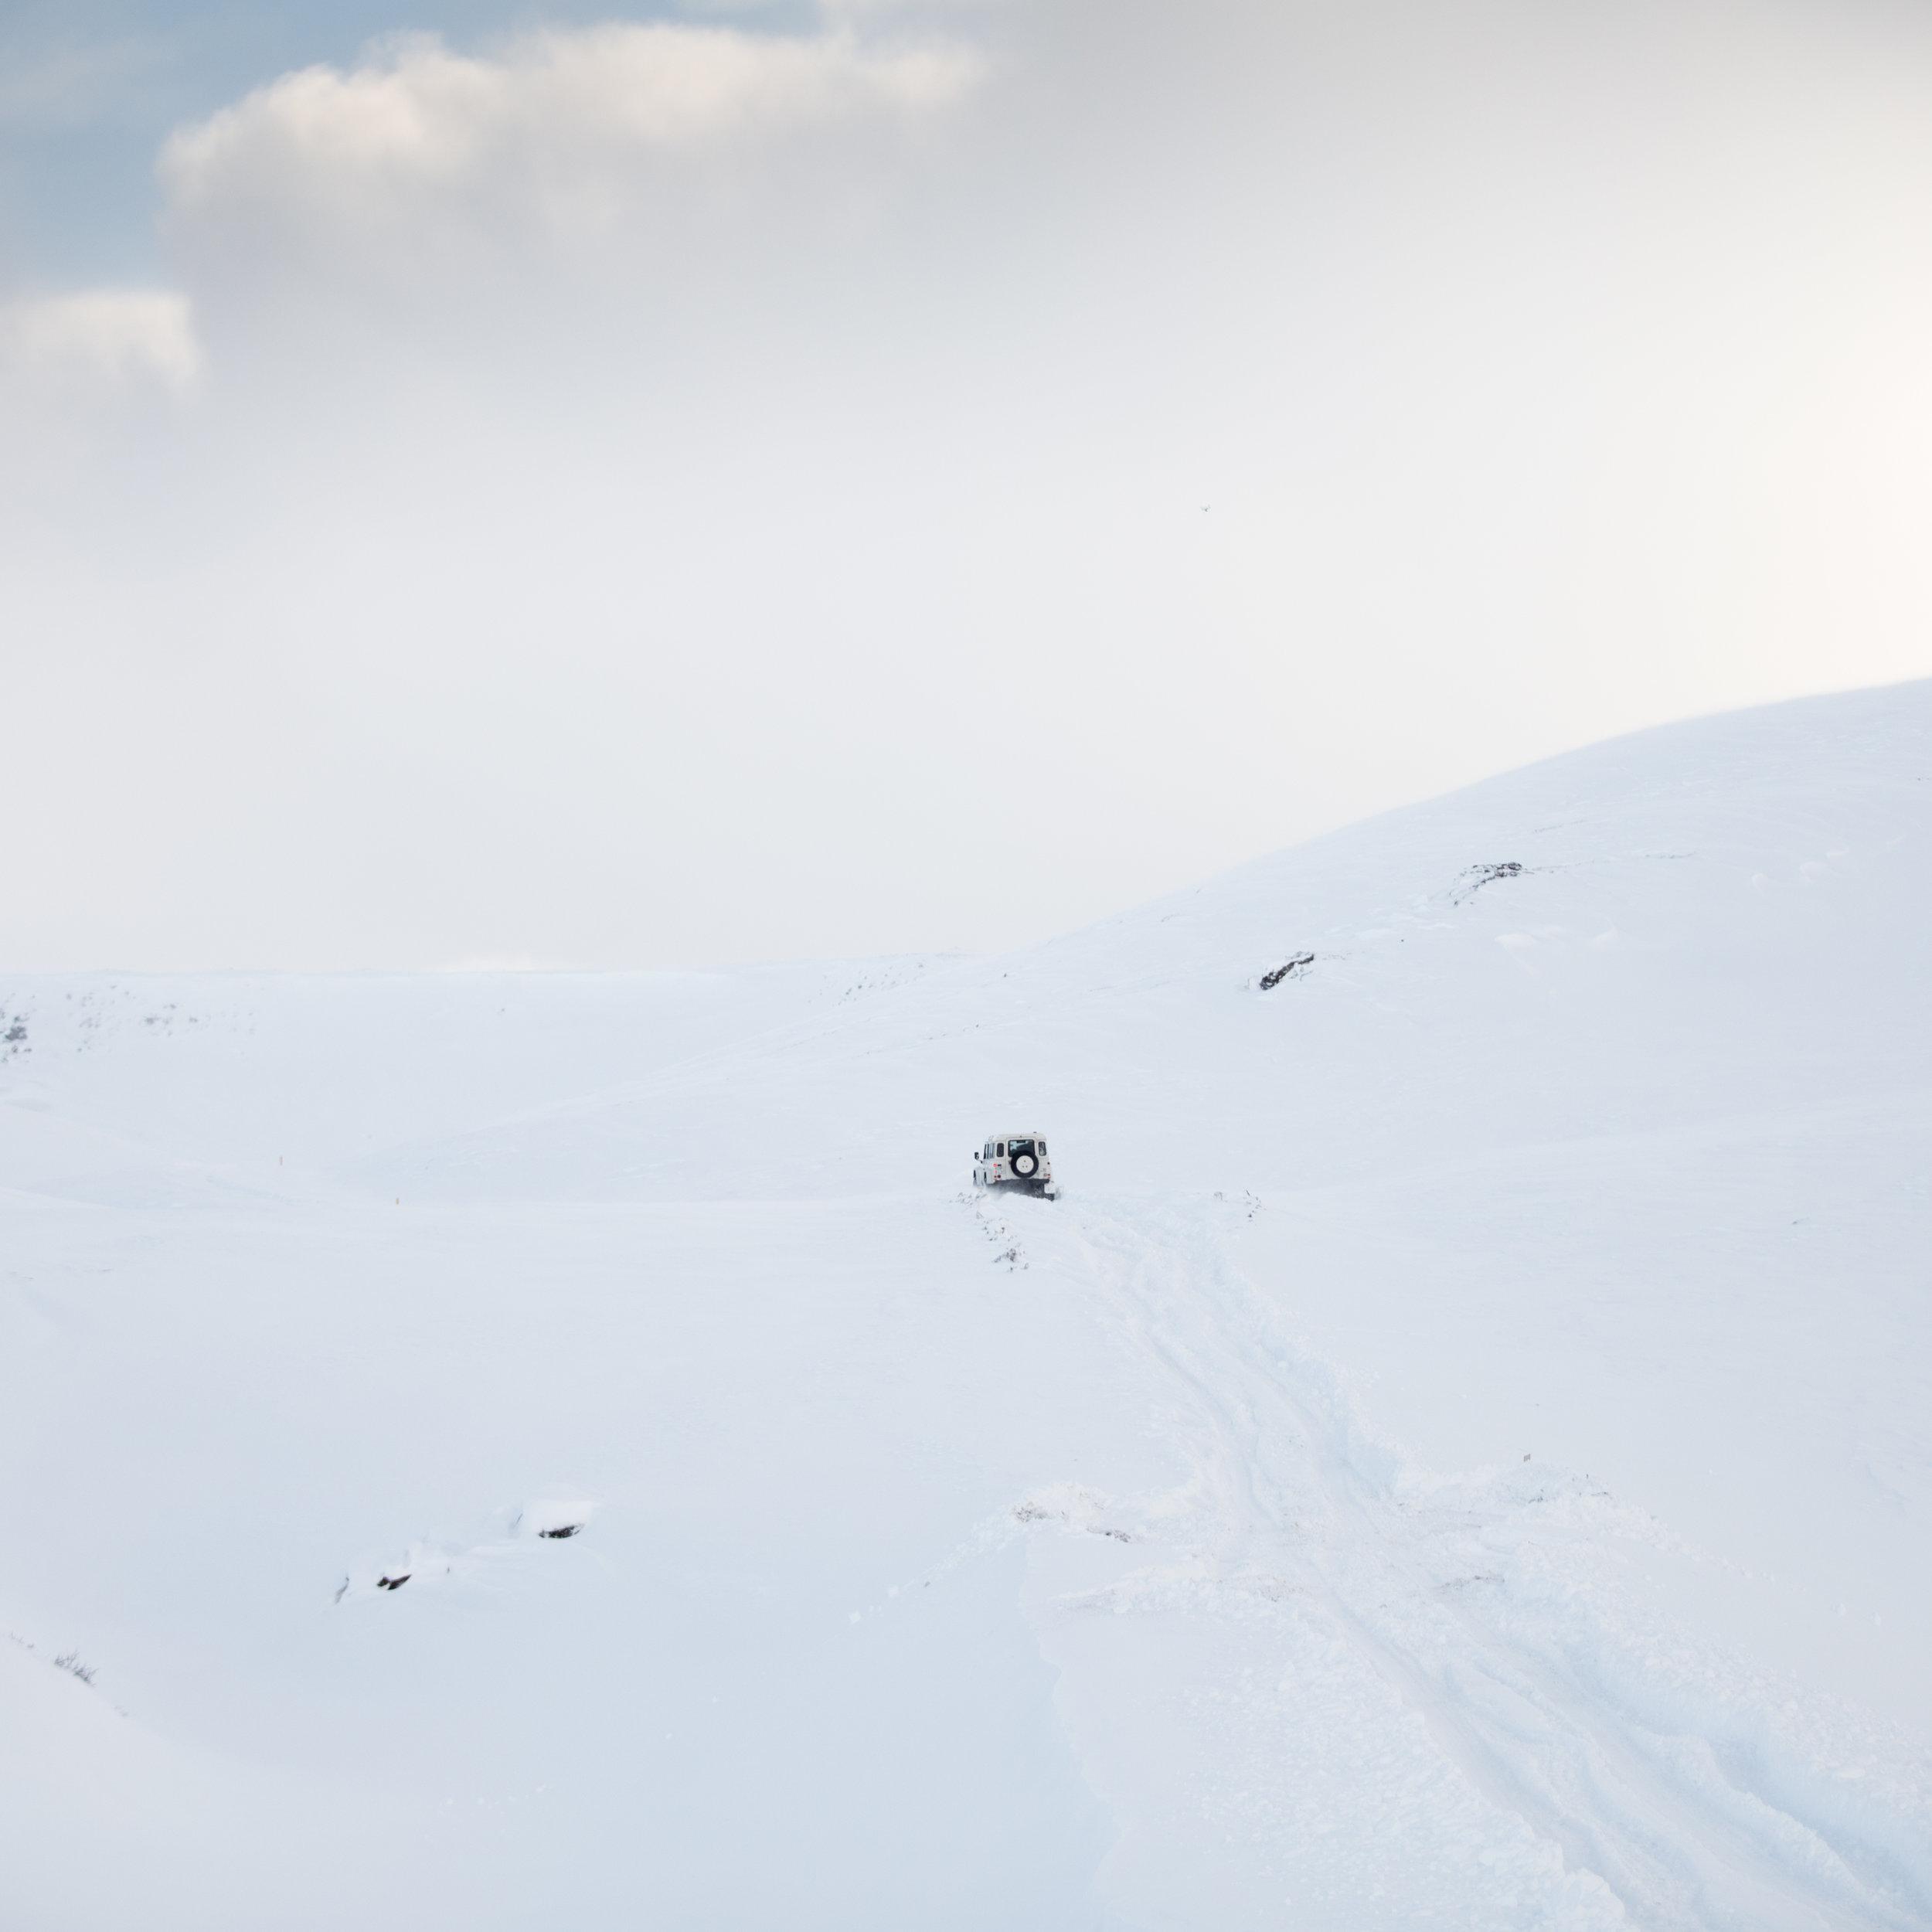 jermiah-schuster-iceland-473.jpg